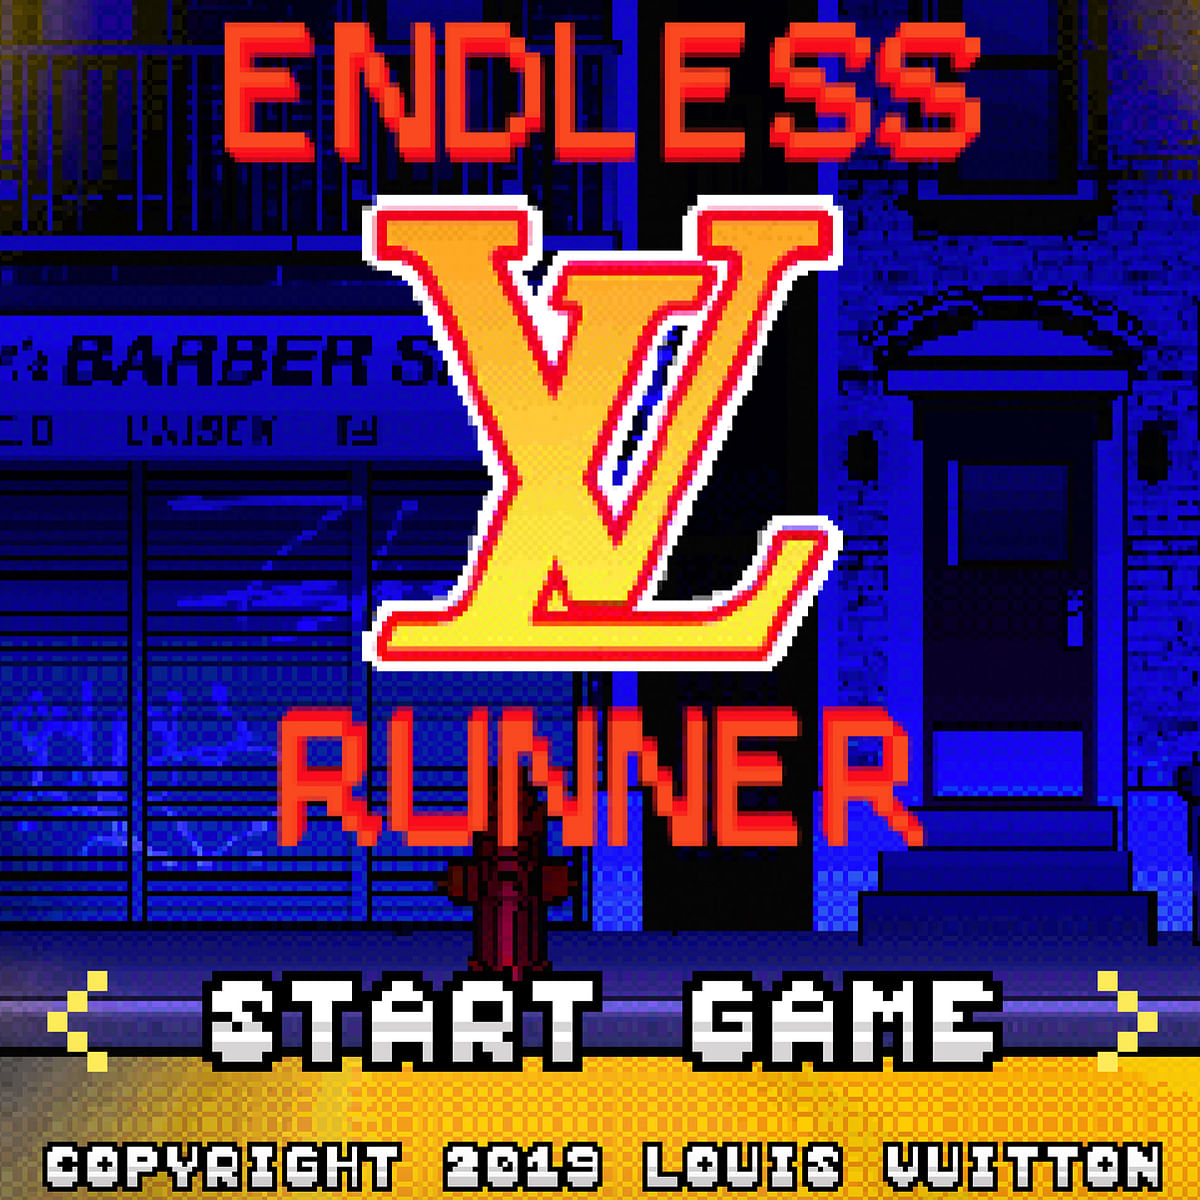 The Louis Vuitton Endless Runner game.